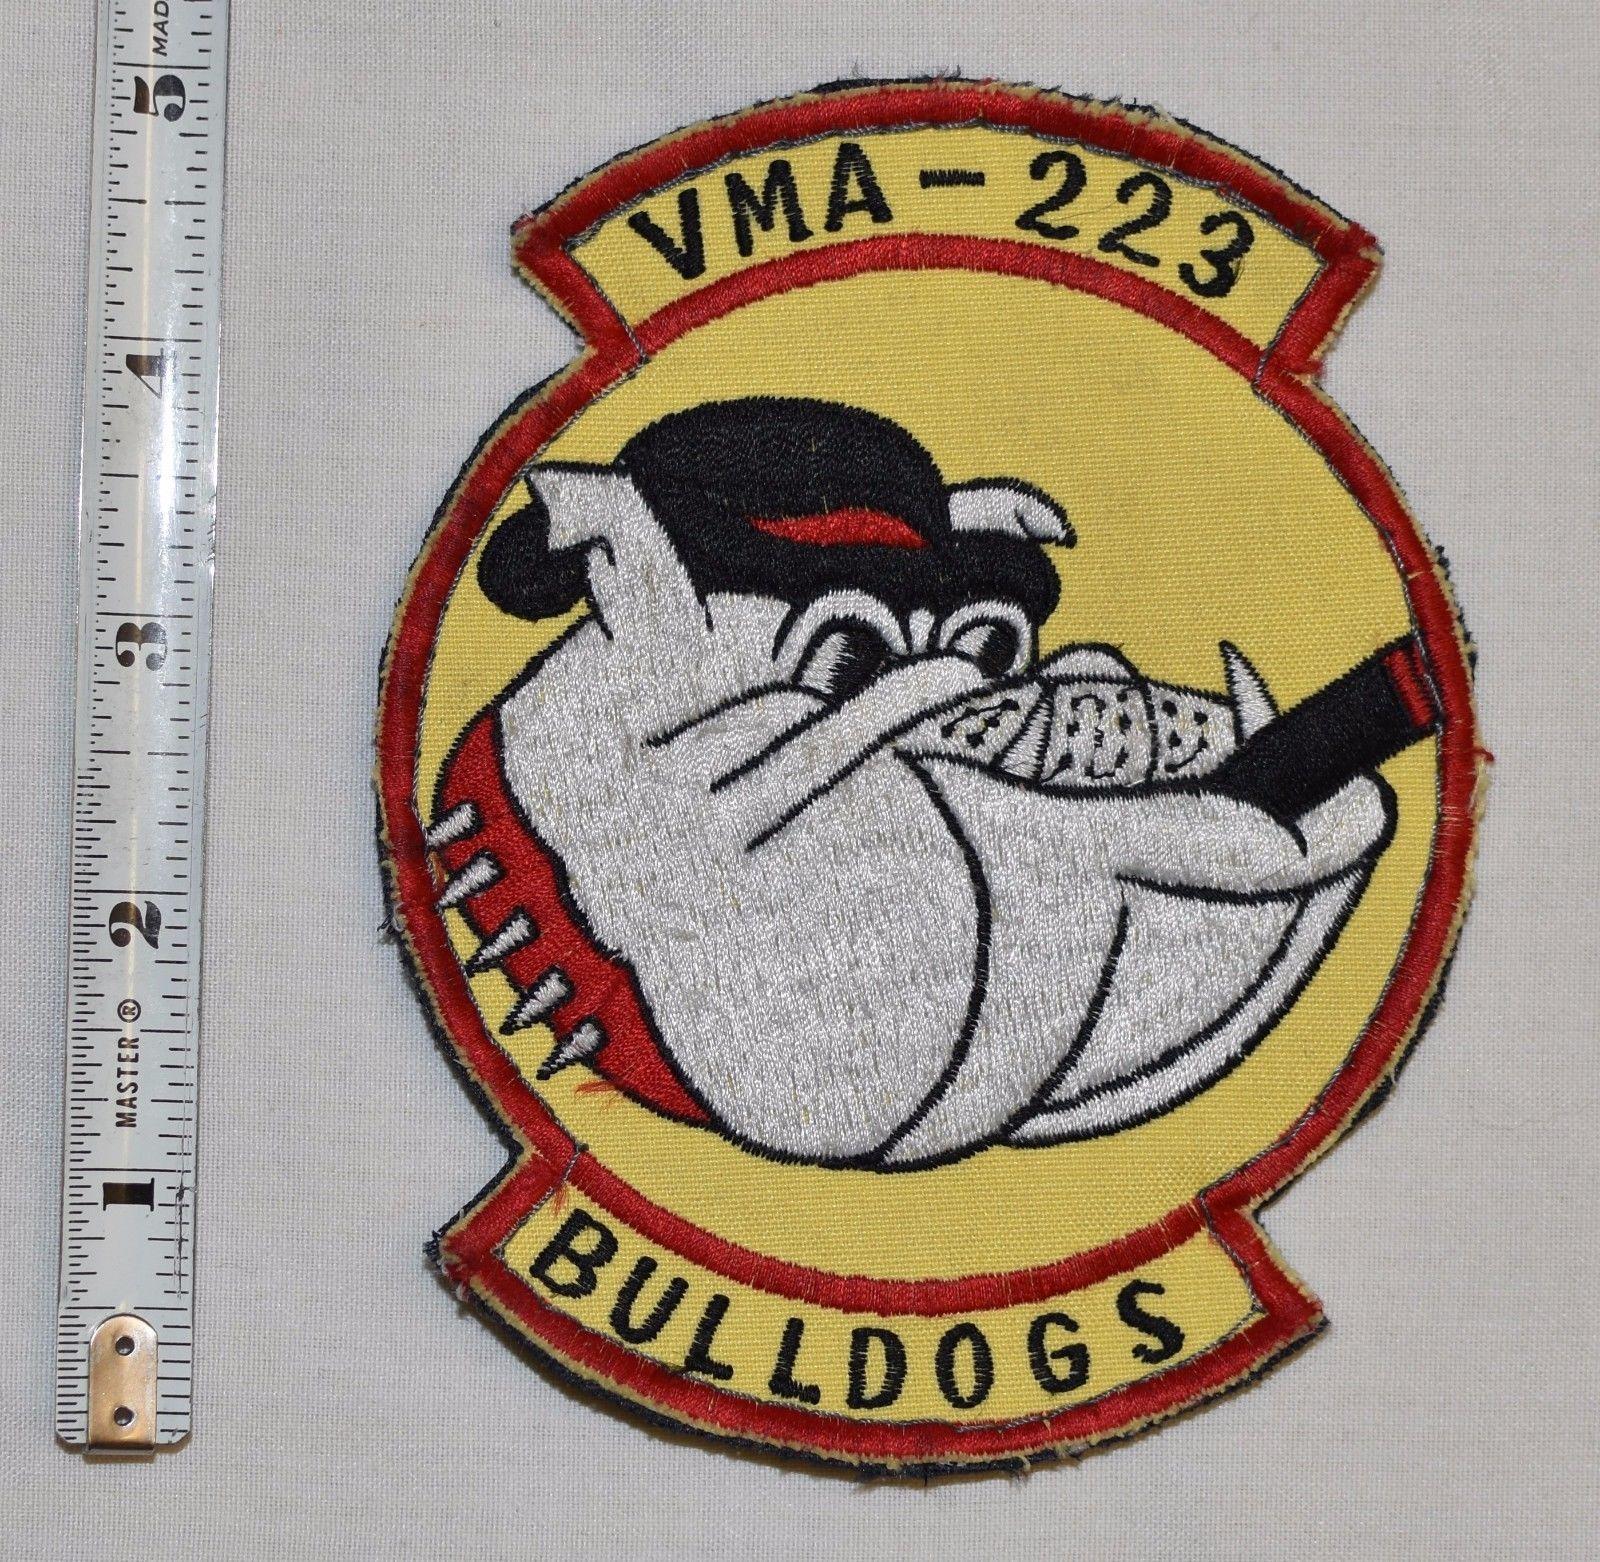 USMC VMA223 FLIGHT SUIT JACKET PATCH MARINE ATTACK